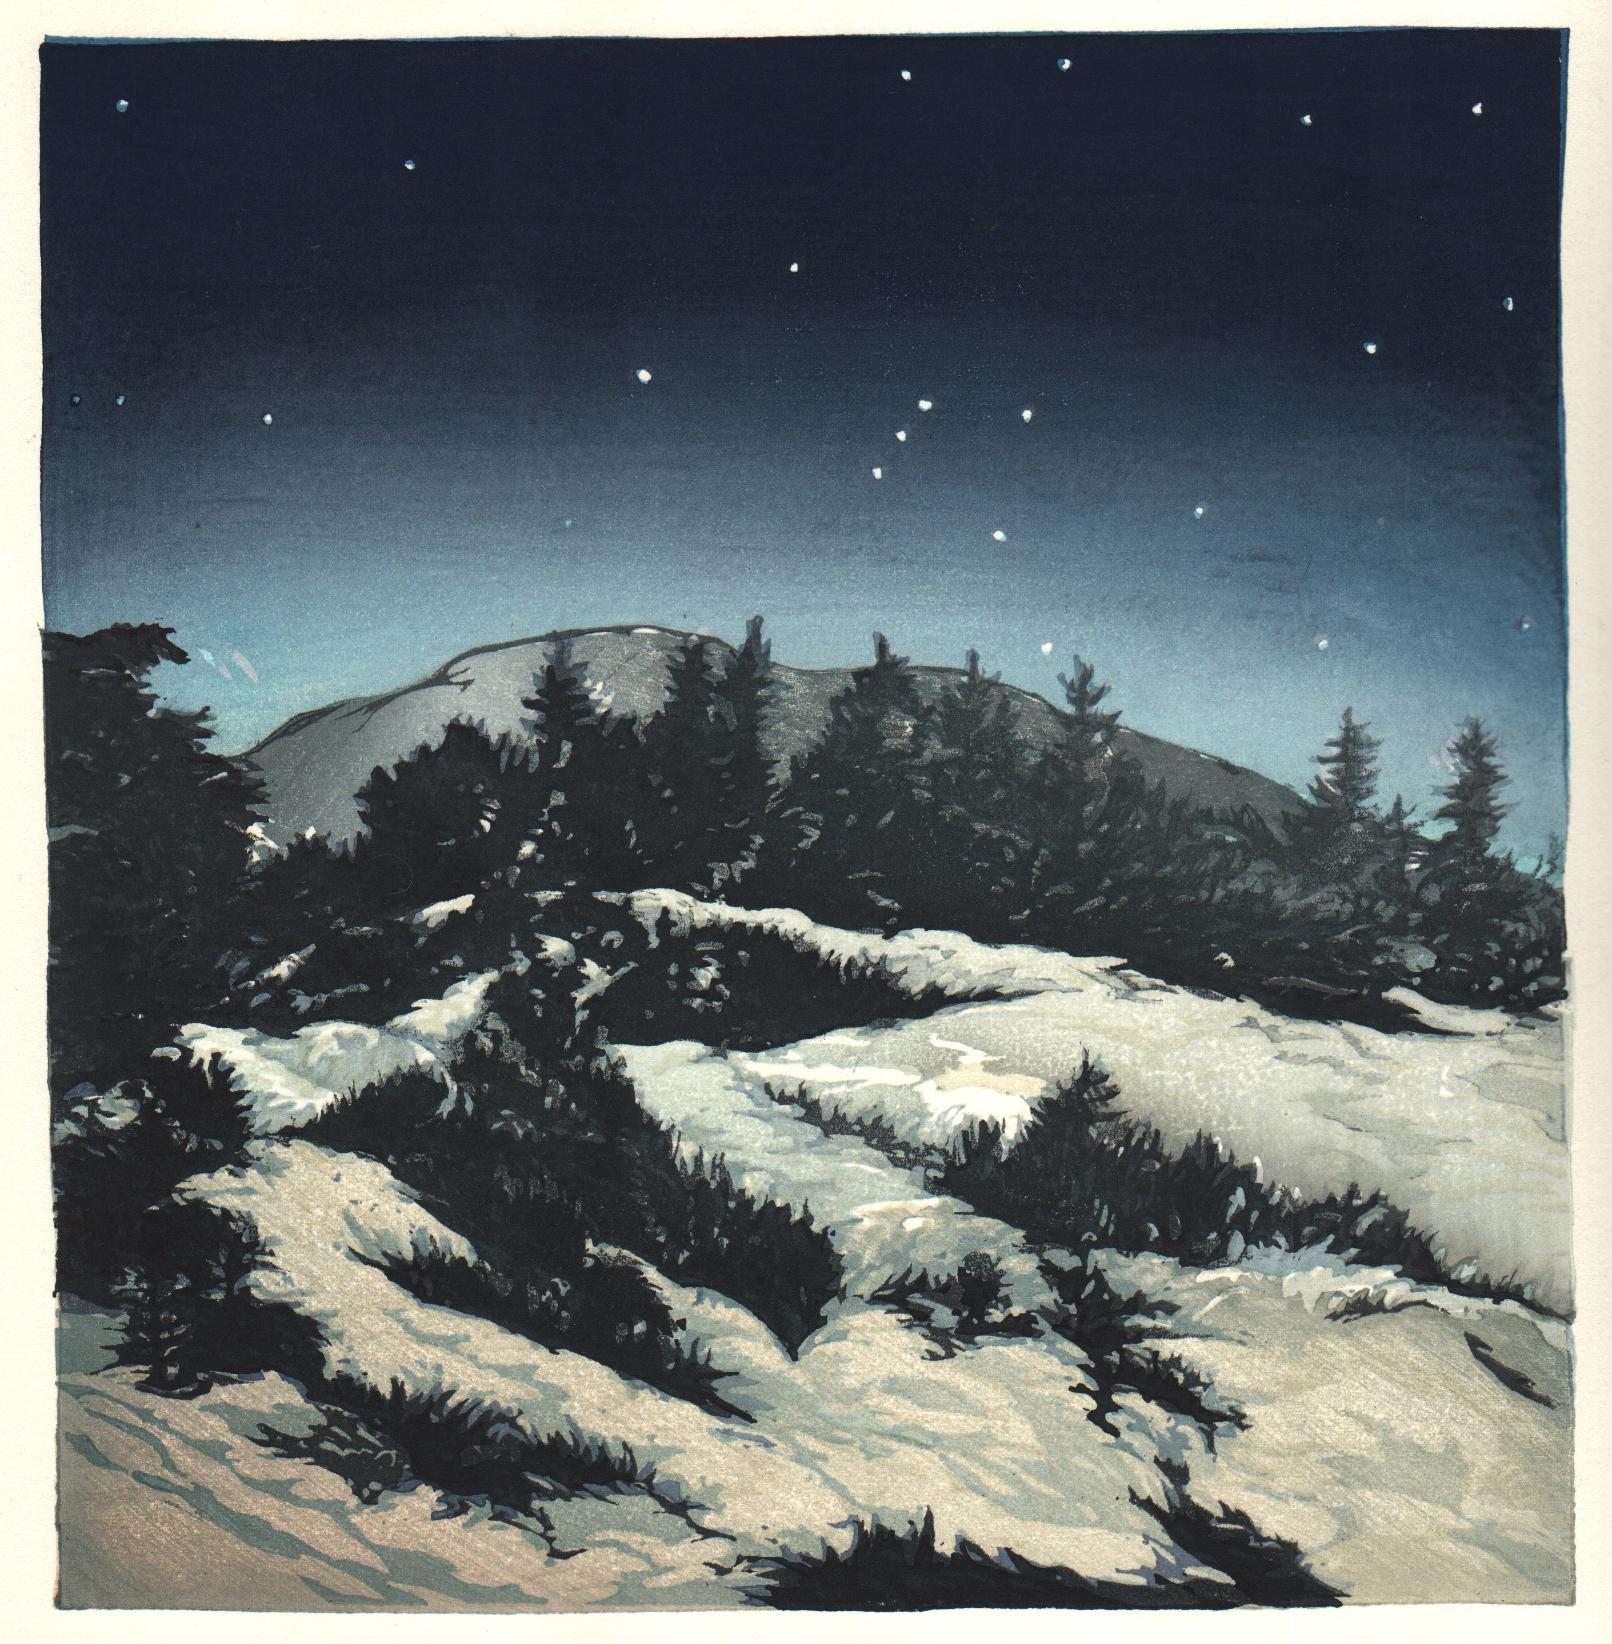 Orion over Mt. Monadnock